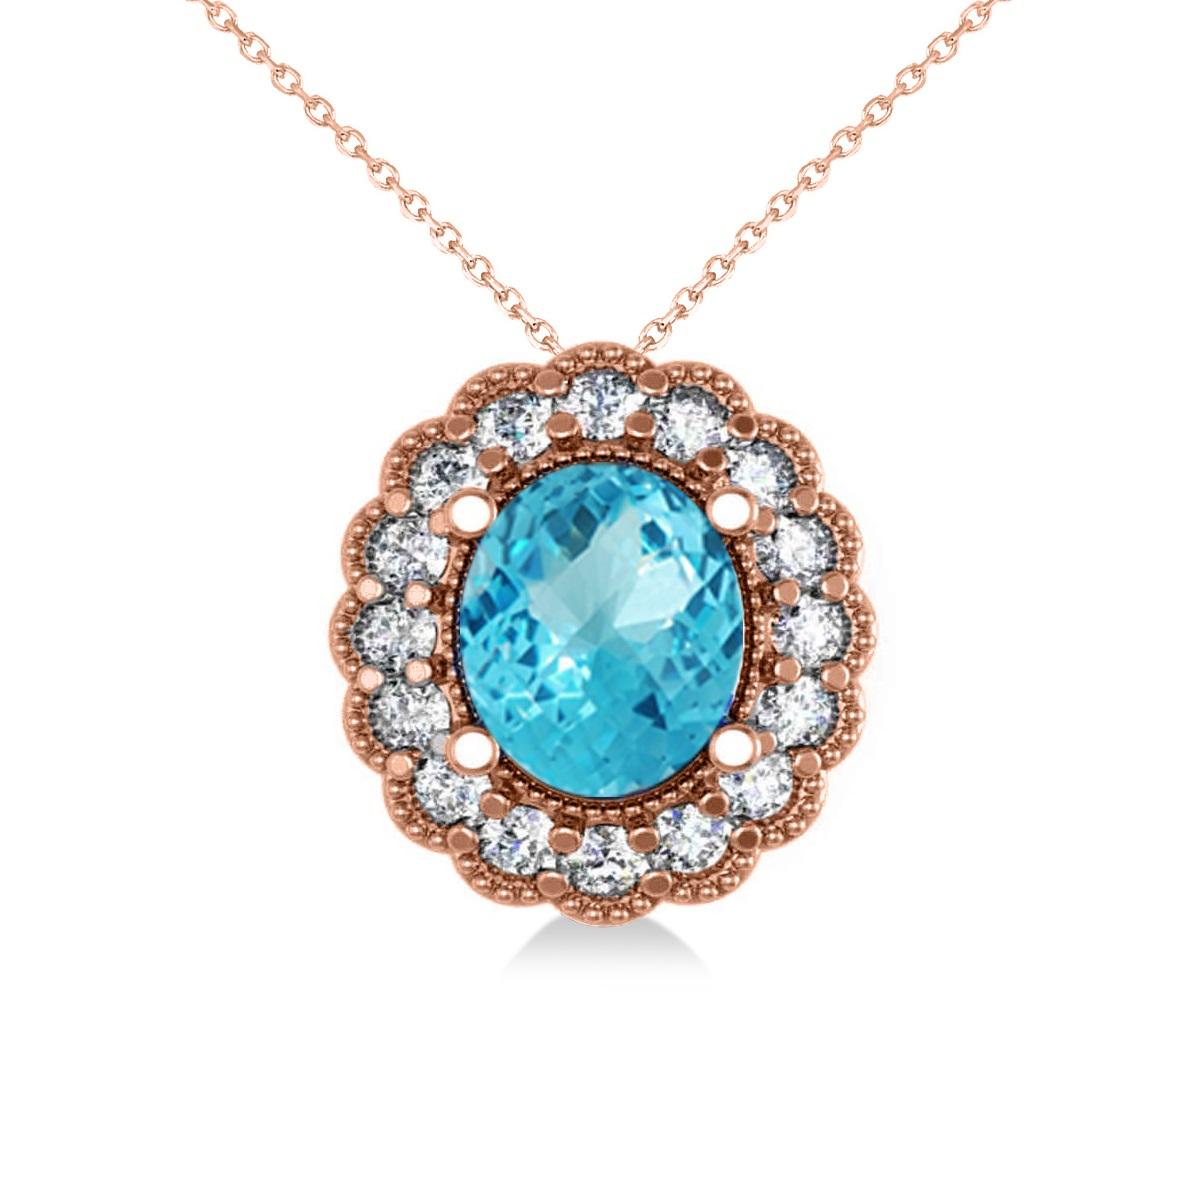 Blue Topaz & Diamond Floral Oval Pendant Necklace 14k Rose Gold (2.98ct)